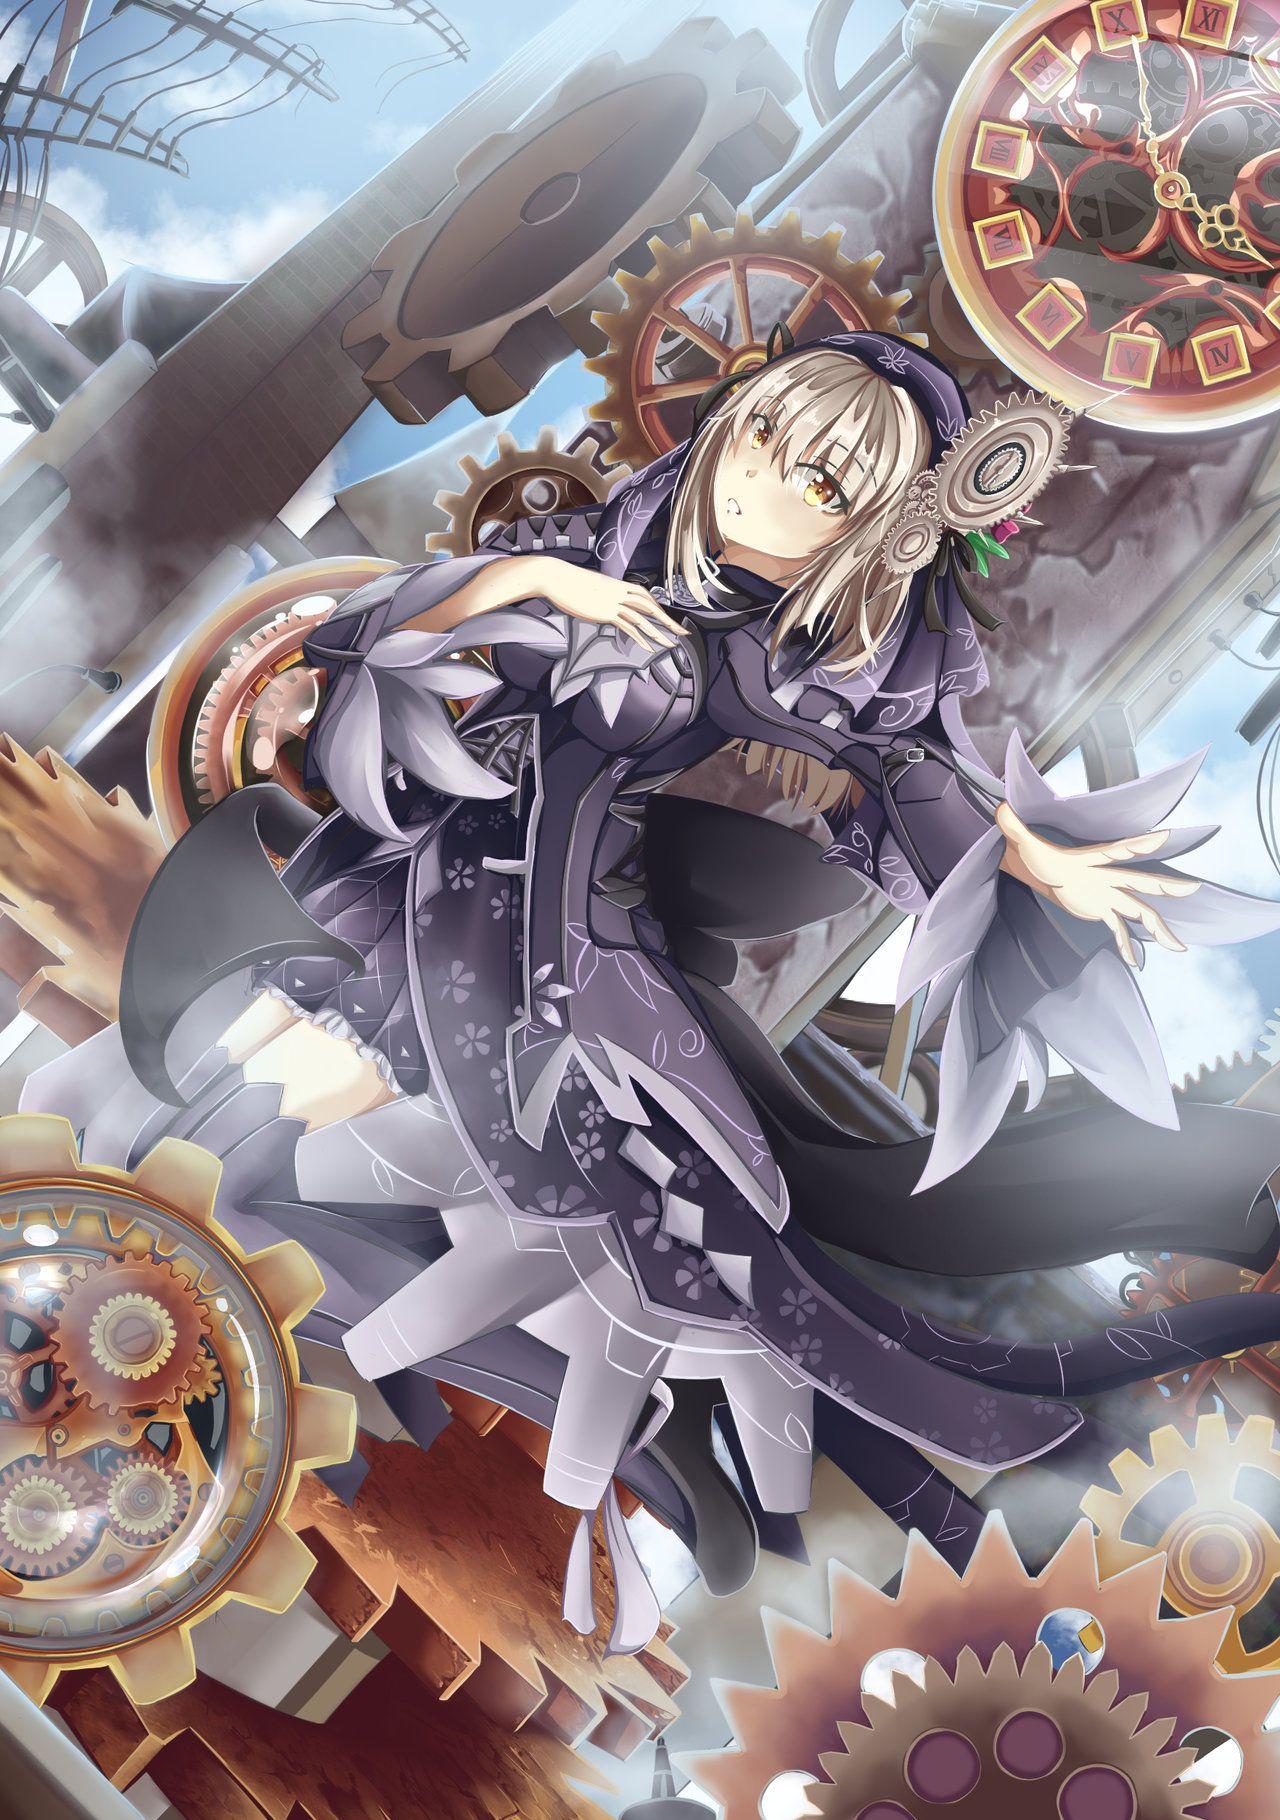 Ryuzu Clockwork art. By D_faction Anime